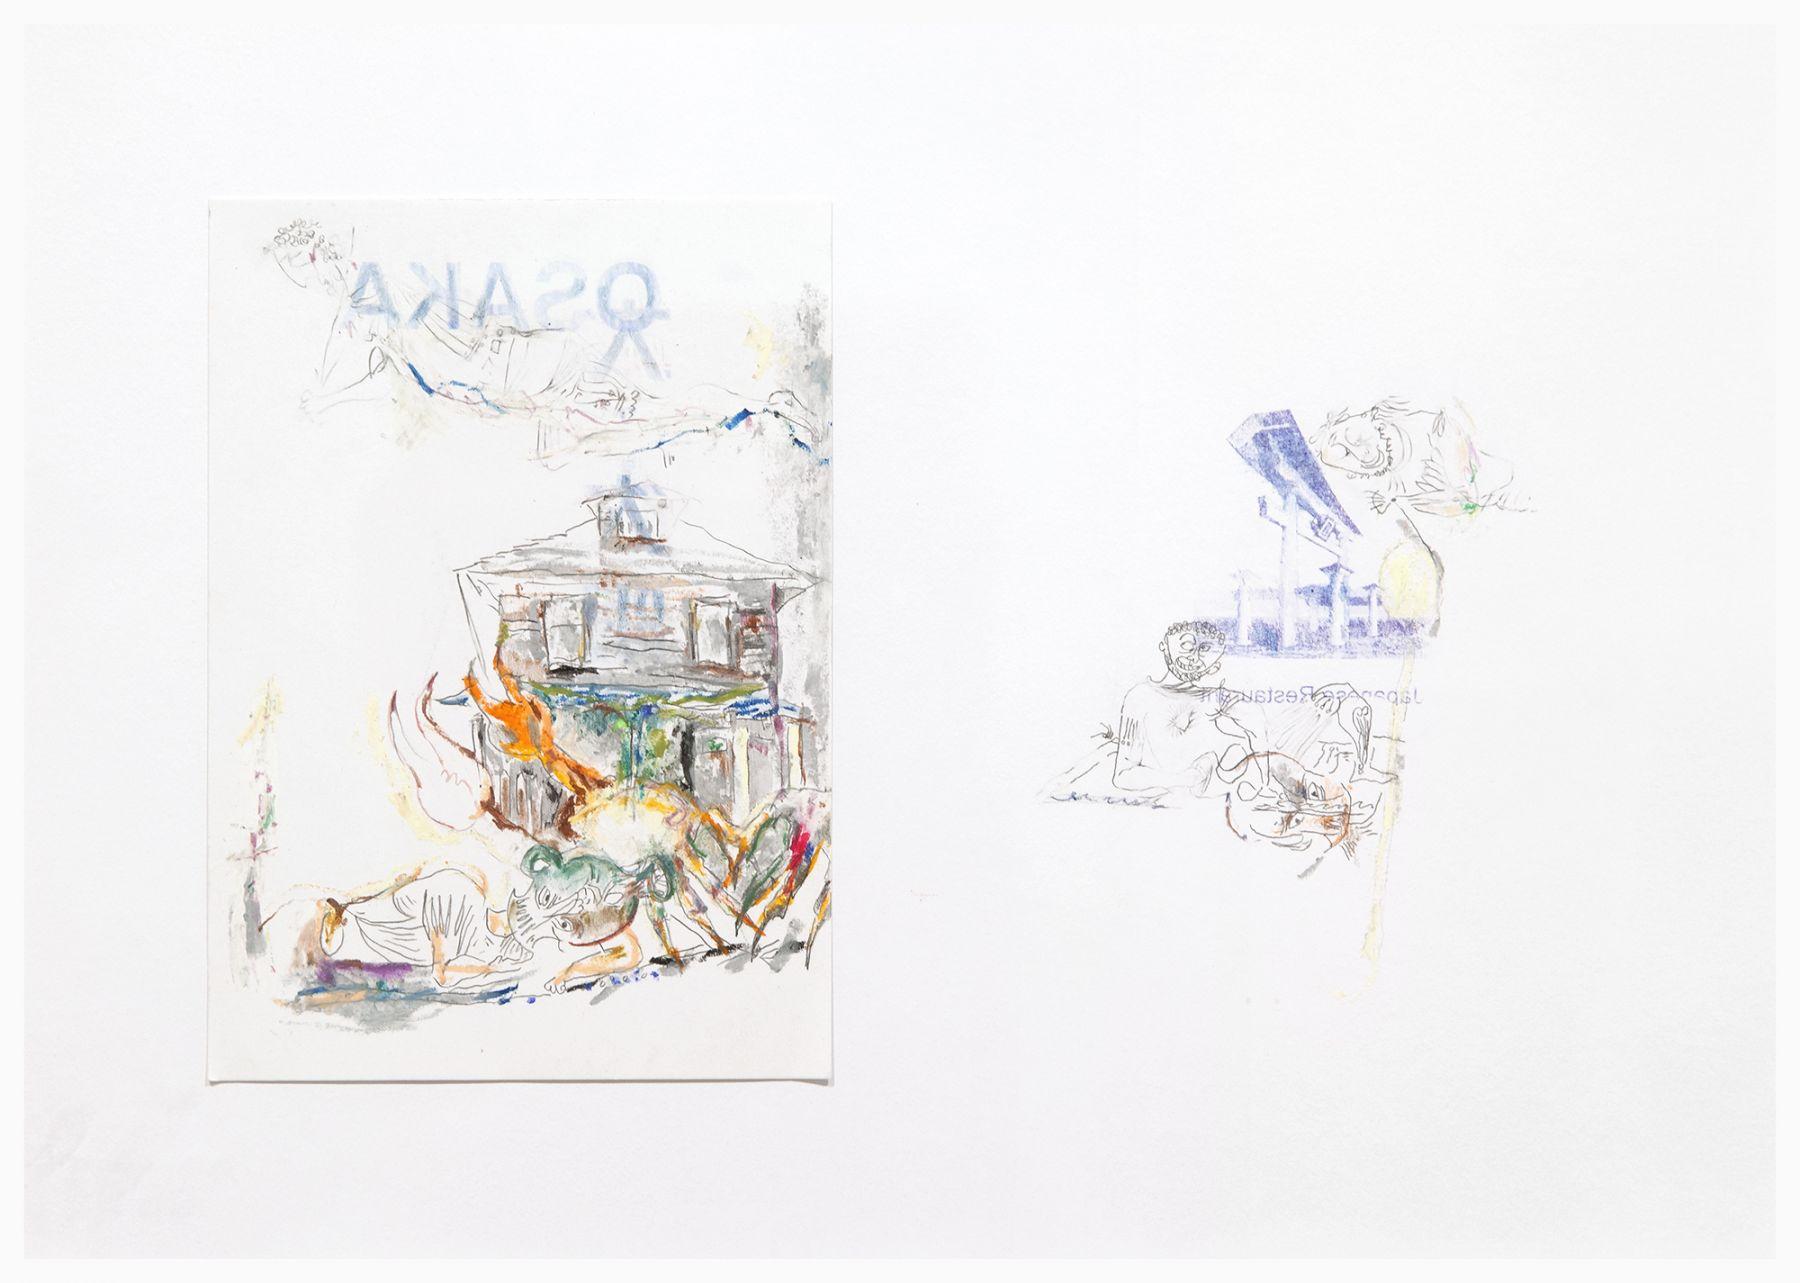 Helen Marten, mud and kings (detail)